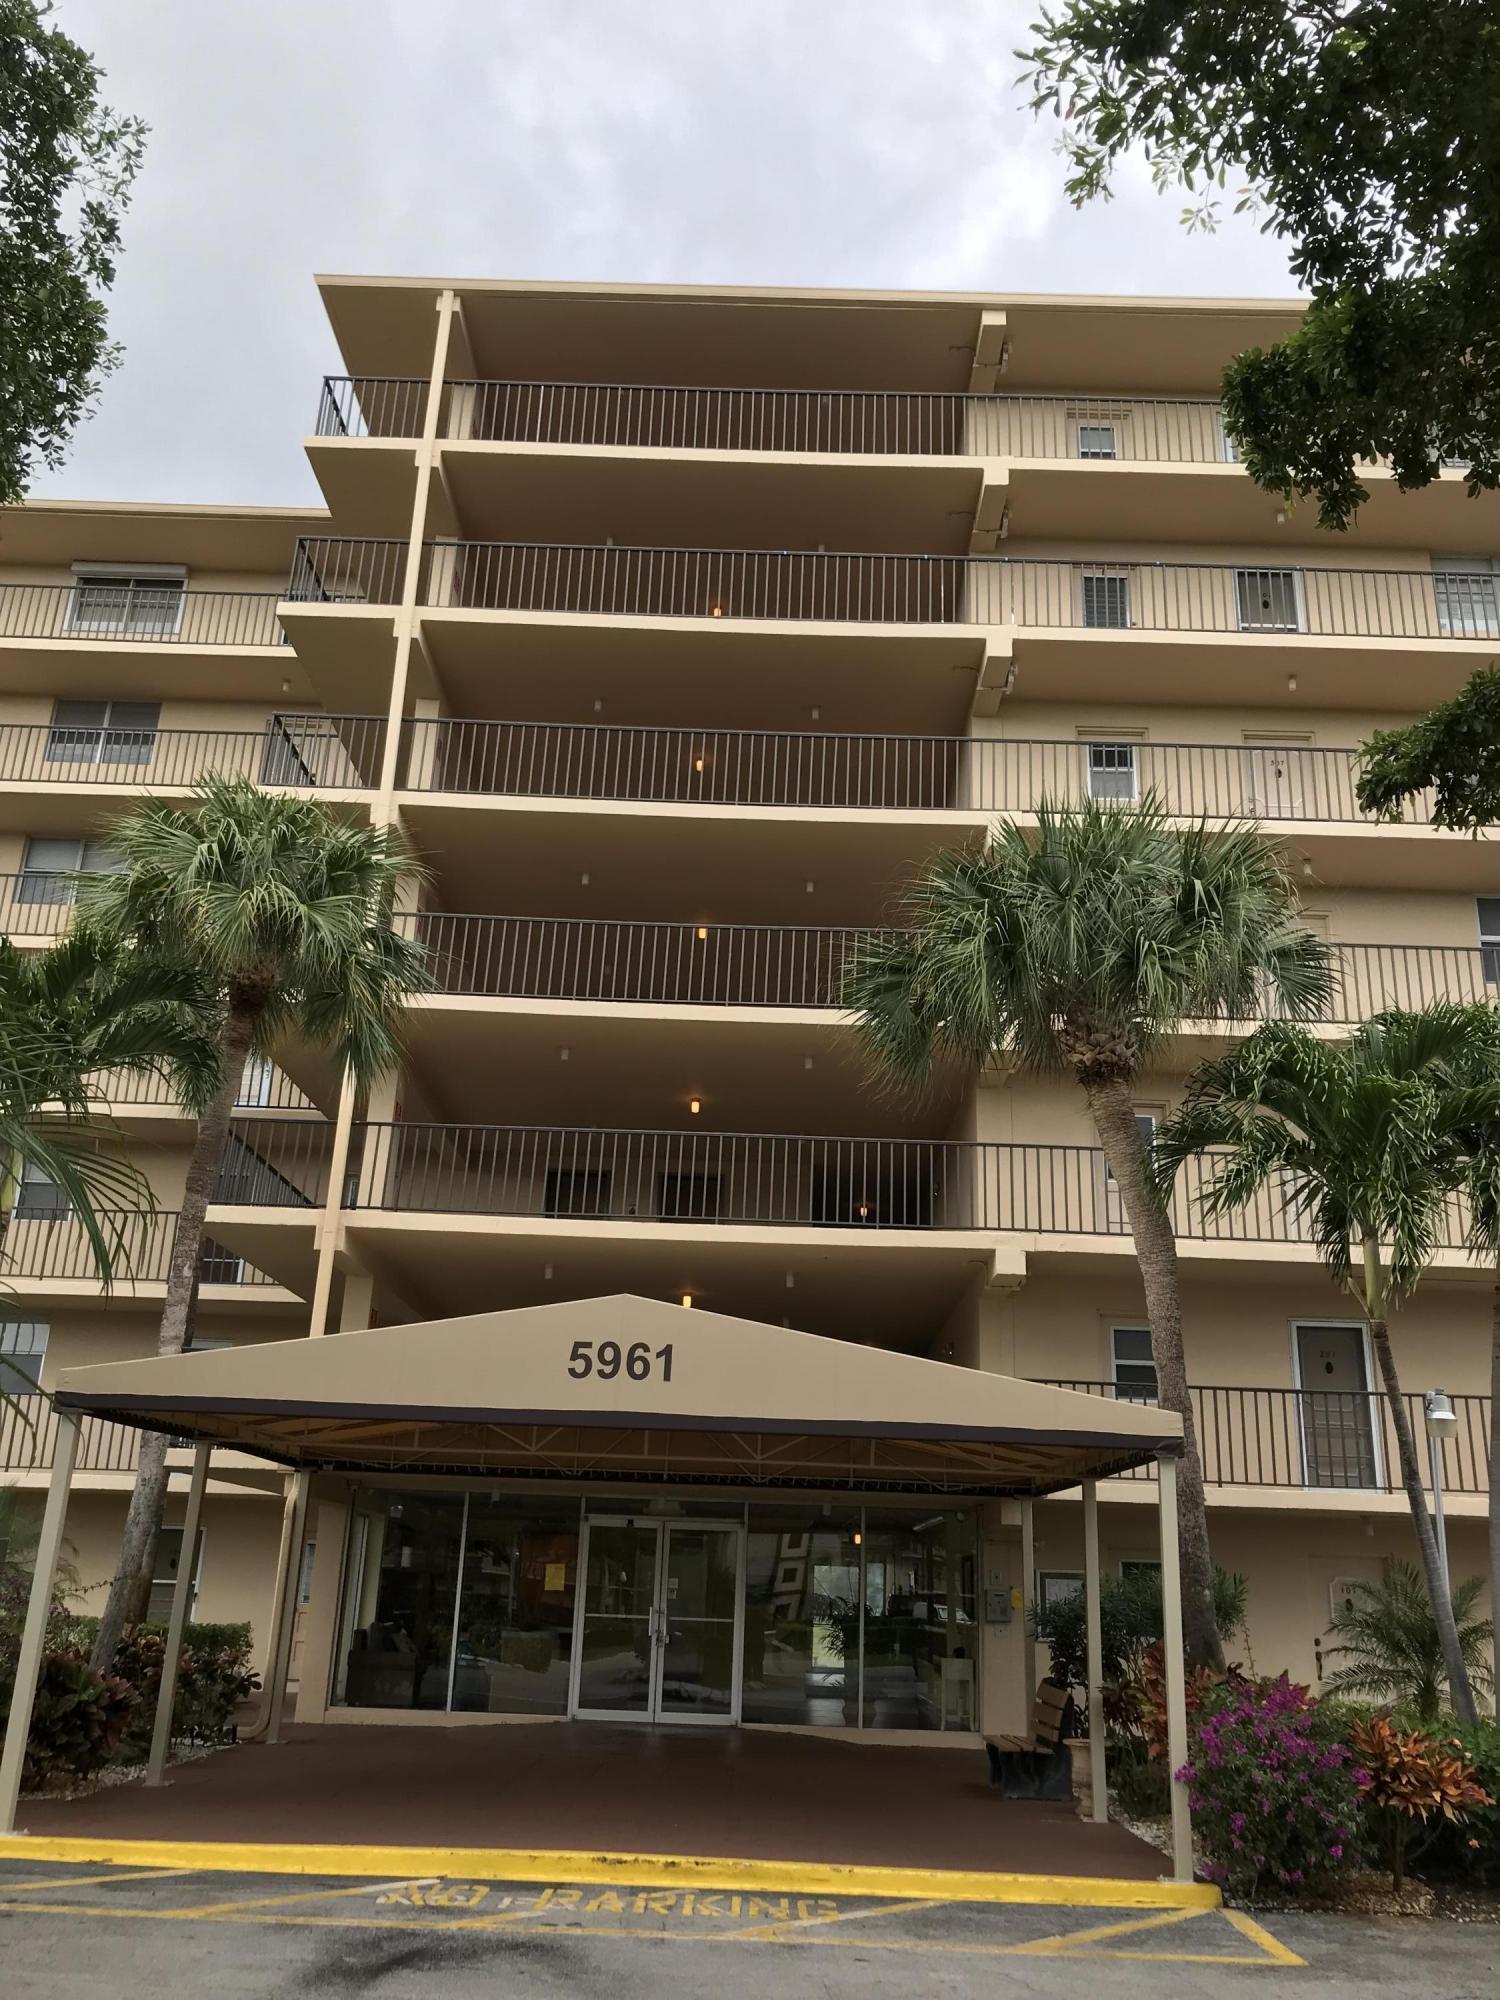 5961 Nw 2nd Avenue #507 Boca Raton, FL 33487